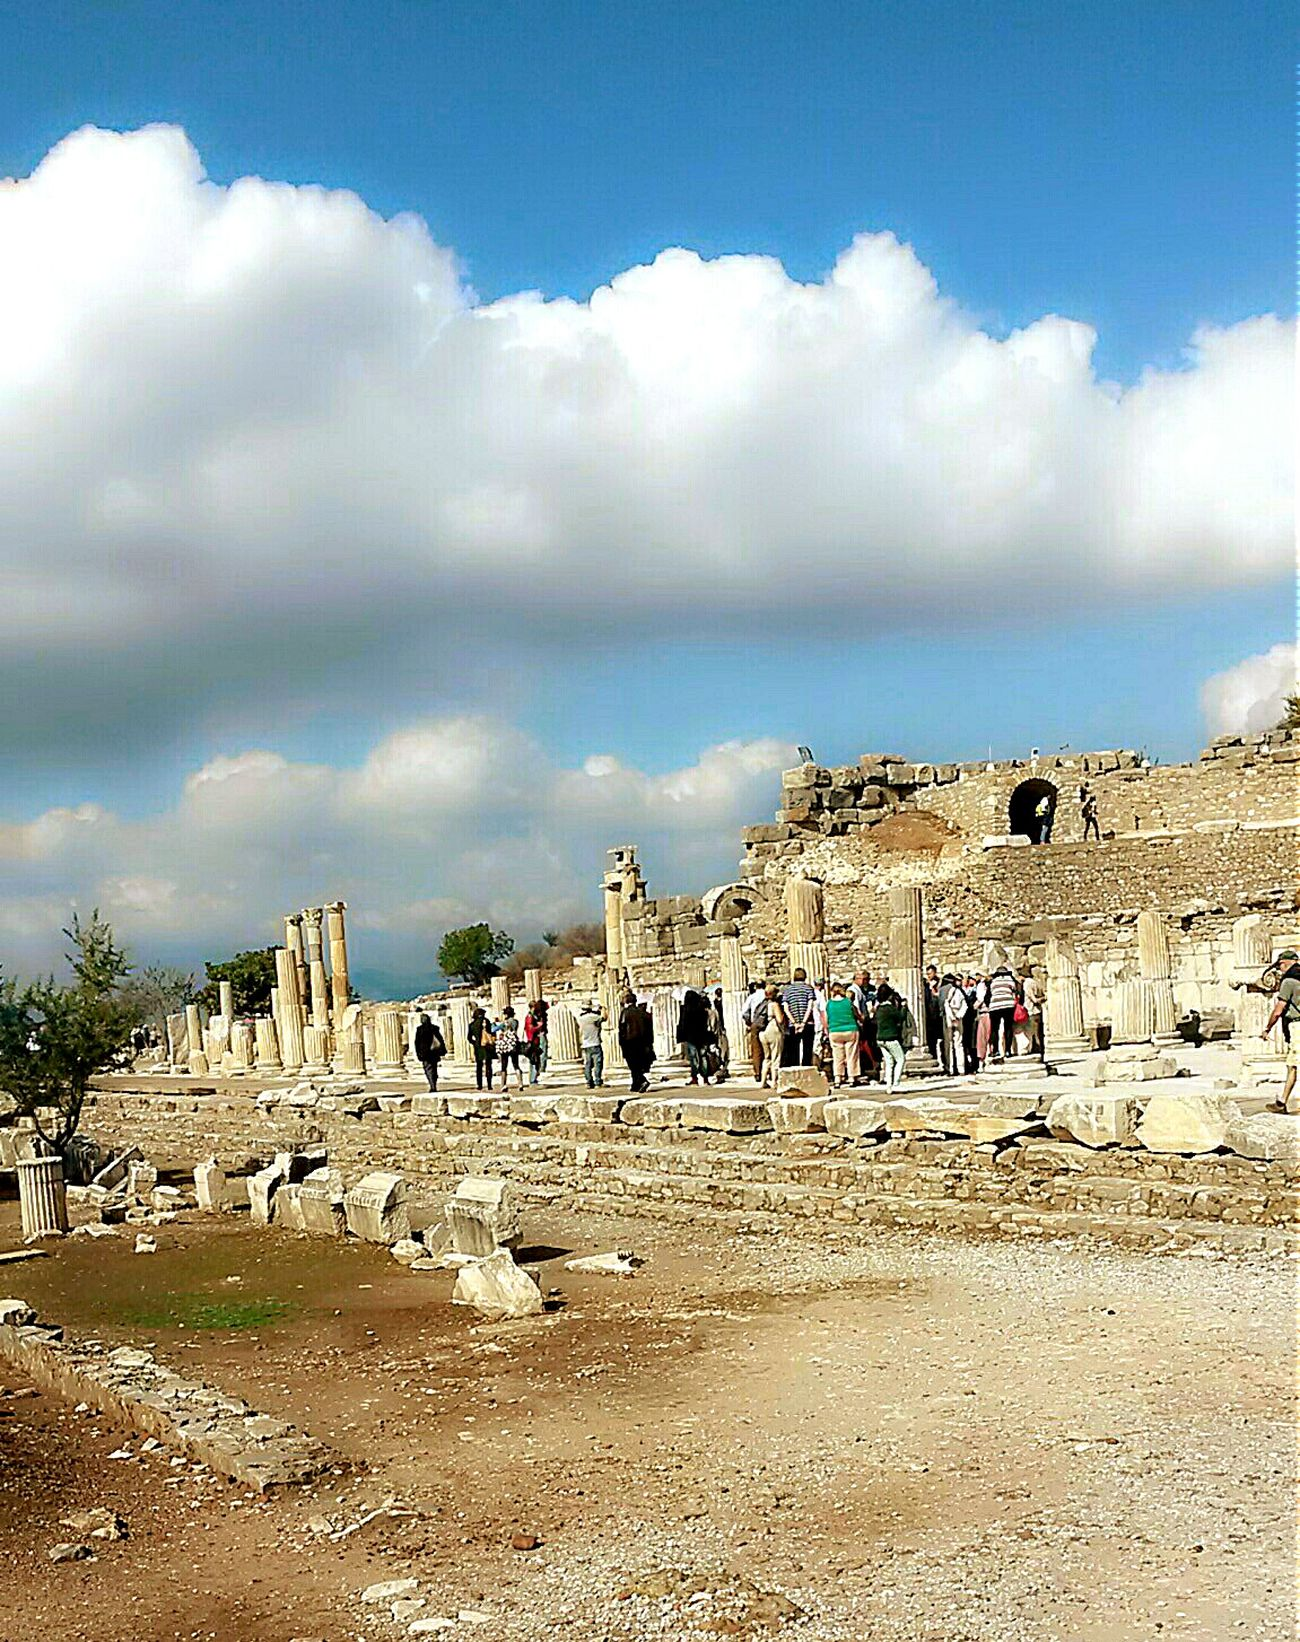 EyeEm Best Shots - Landscape Ephesus Holiday And Relaxing Eyeem Ephesus - Turkey